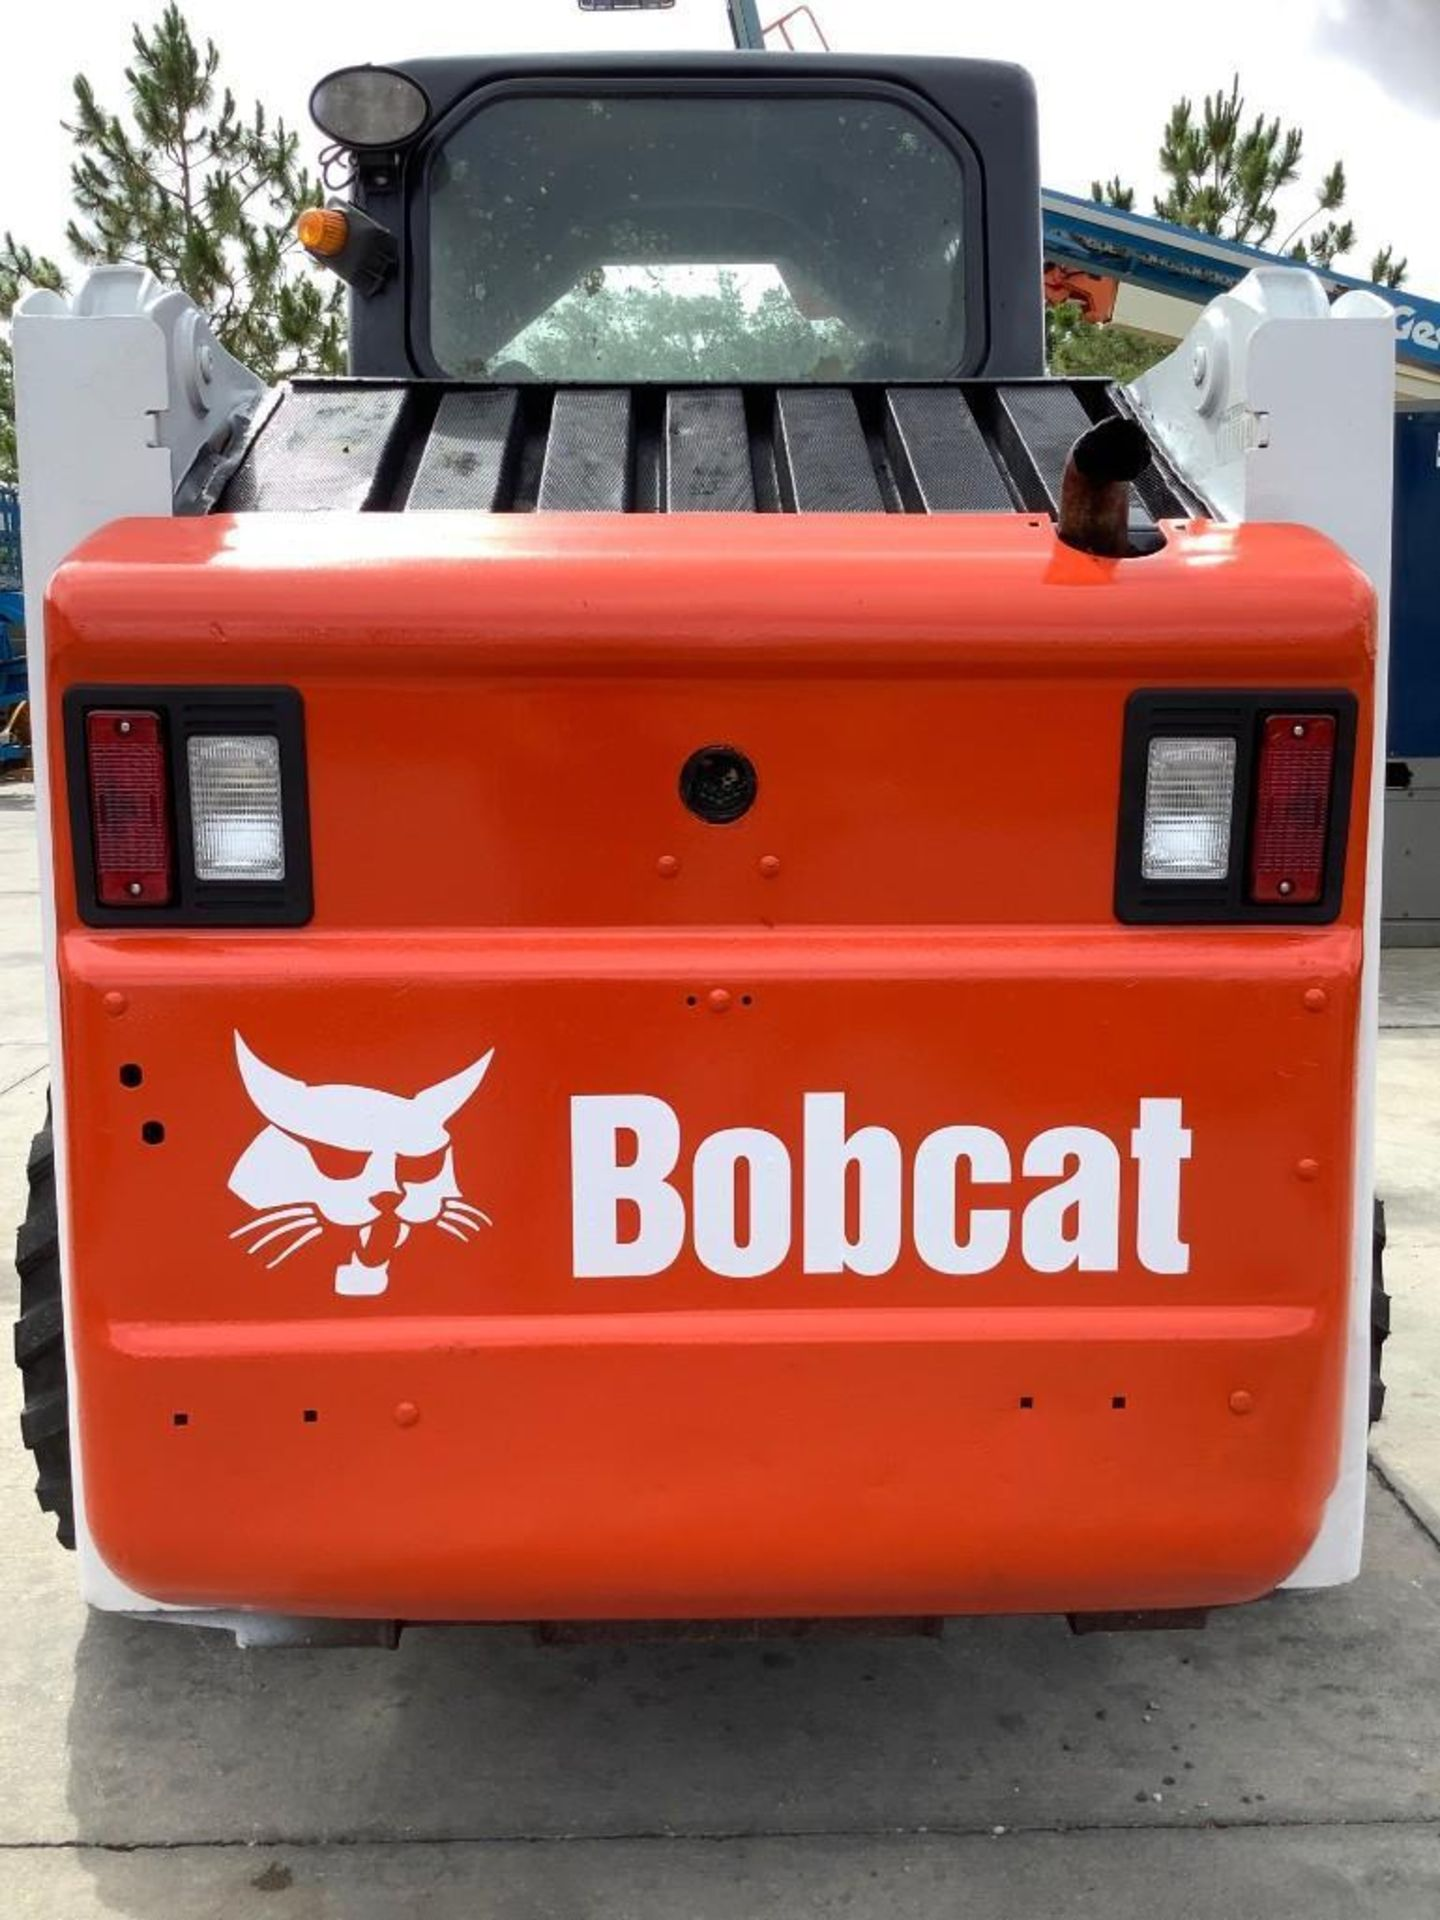 BOBCAT COMPACT SKIDSTEER MODEL S160, CATERPILLAR BUCKET WITH TOP CLAMP ATTACHMENT, DIESEL - Image 6 of 12